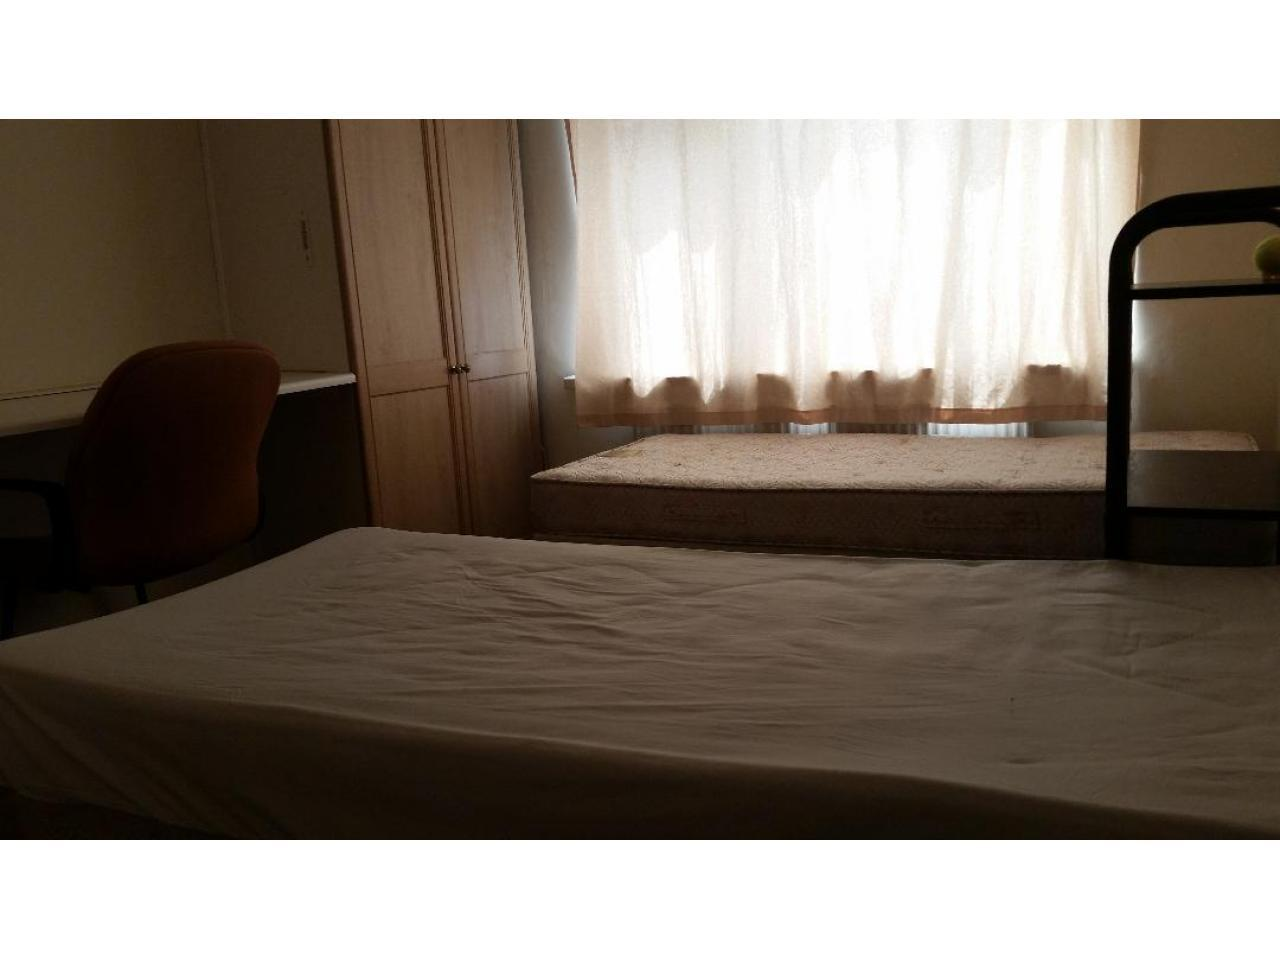 Сдаем  Double Room Hounslow  TW3 4AW £115 в неделю - 3